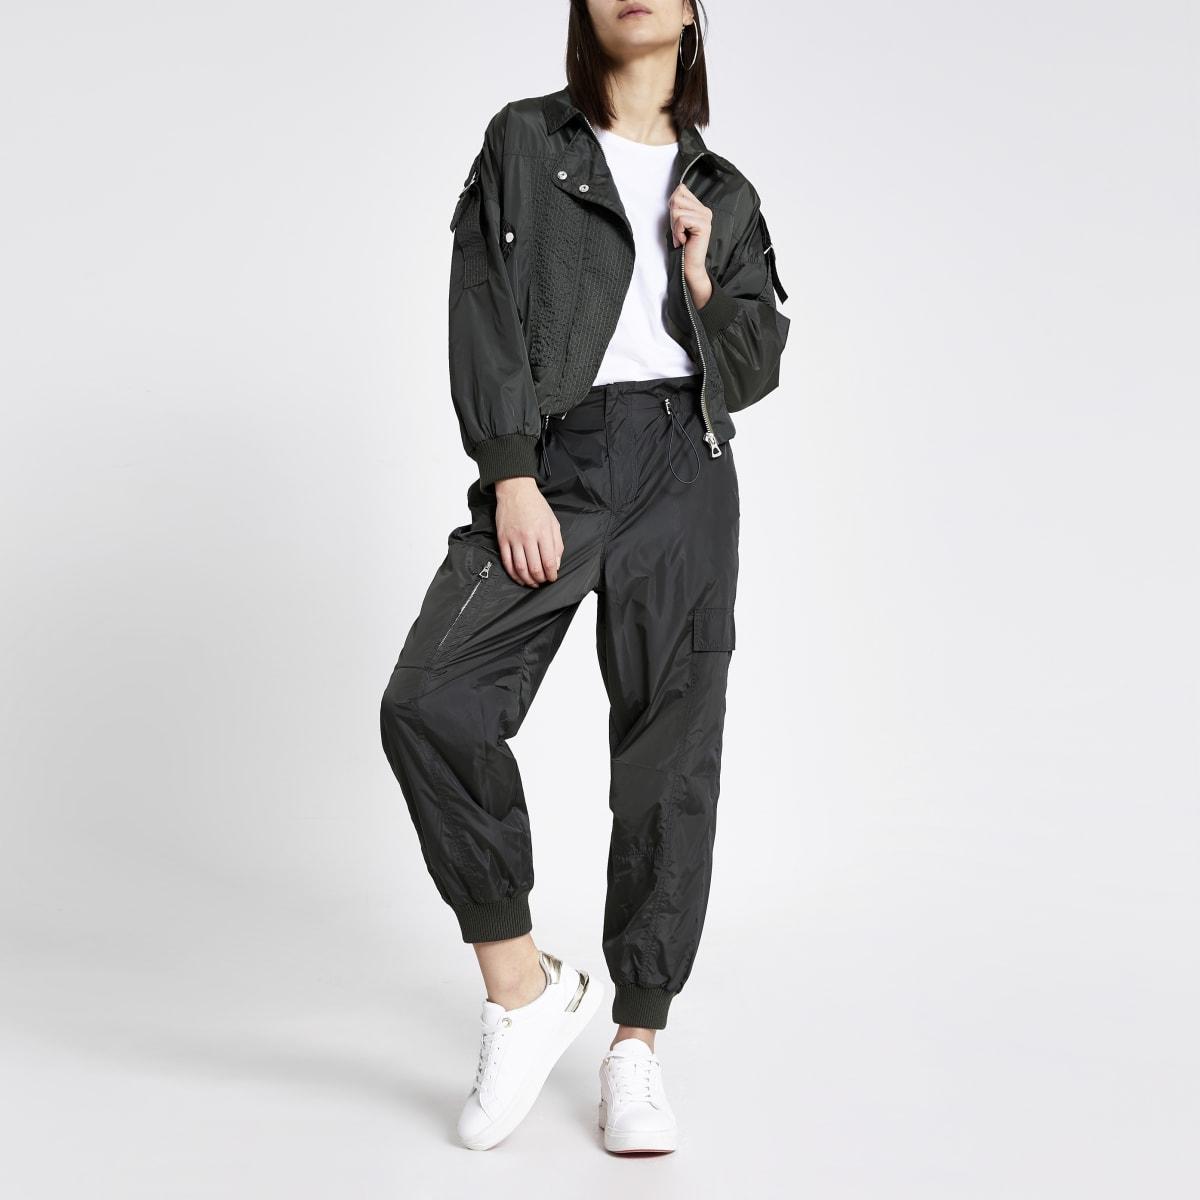 Pantalon kaki en nylon à taille haute ceinturée avec cordon